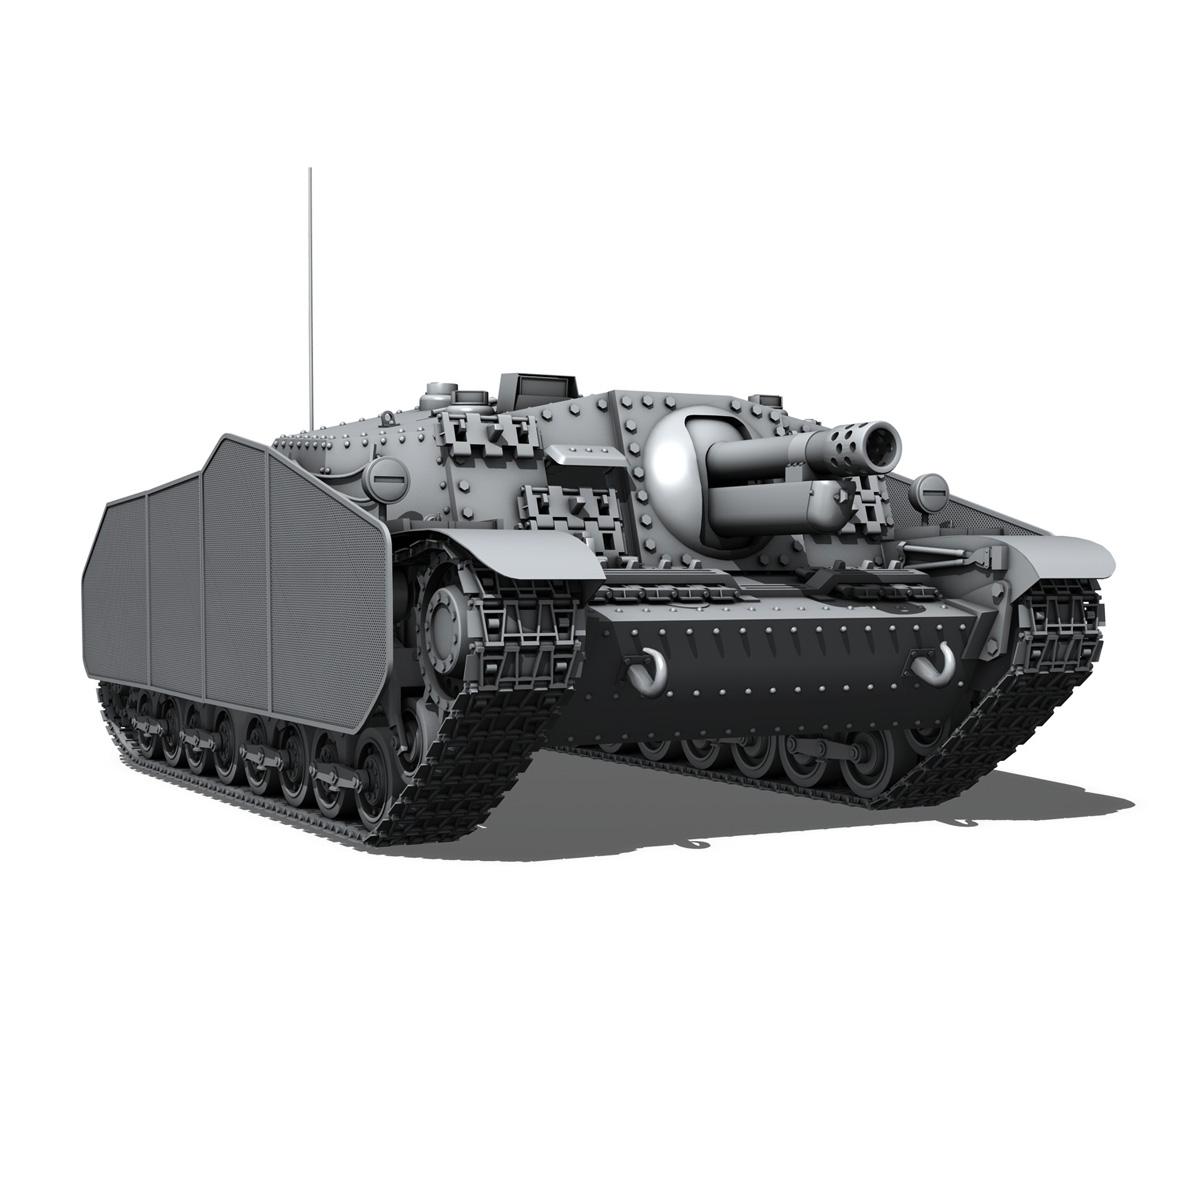 43m zrinyi ii - Macar hücum silahı 3d model 3ds fbx c4d lwo obj 251636